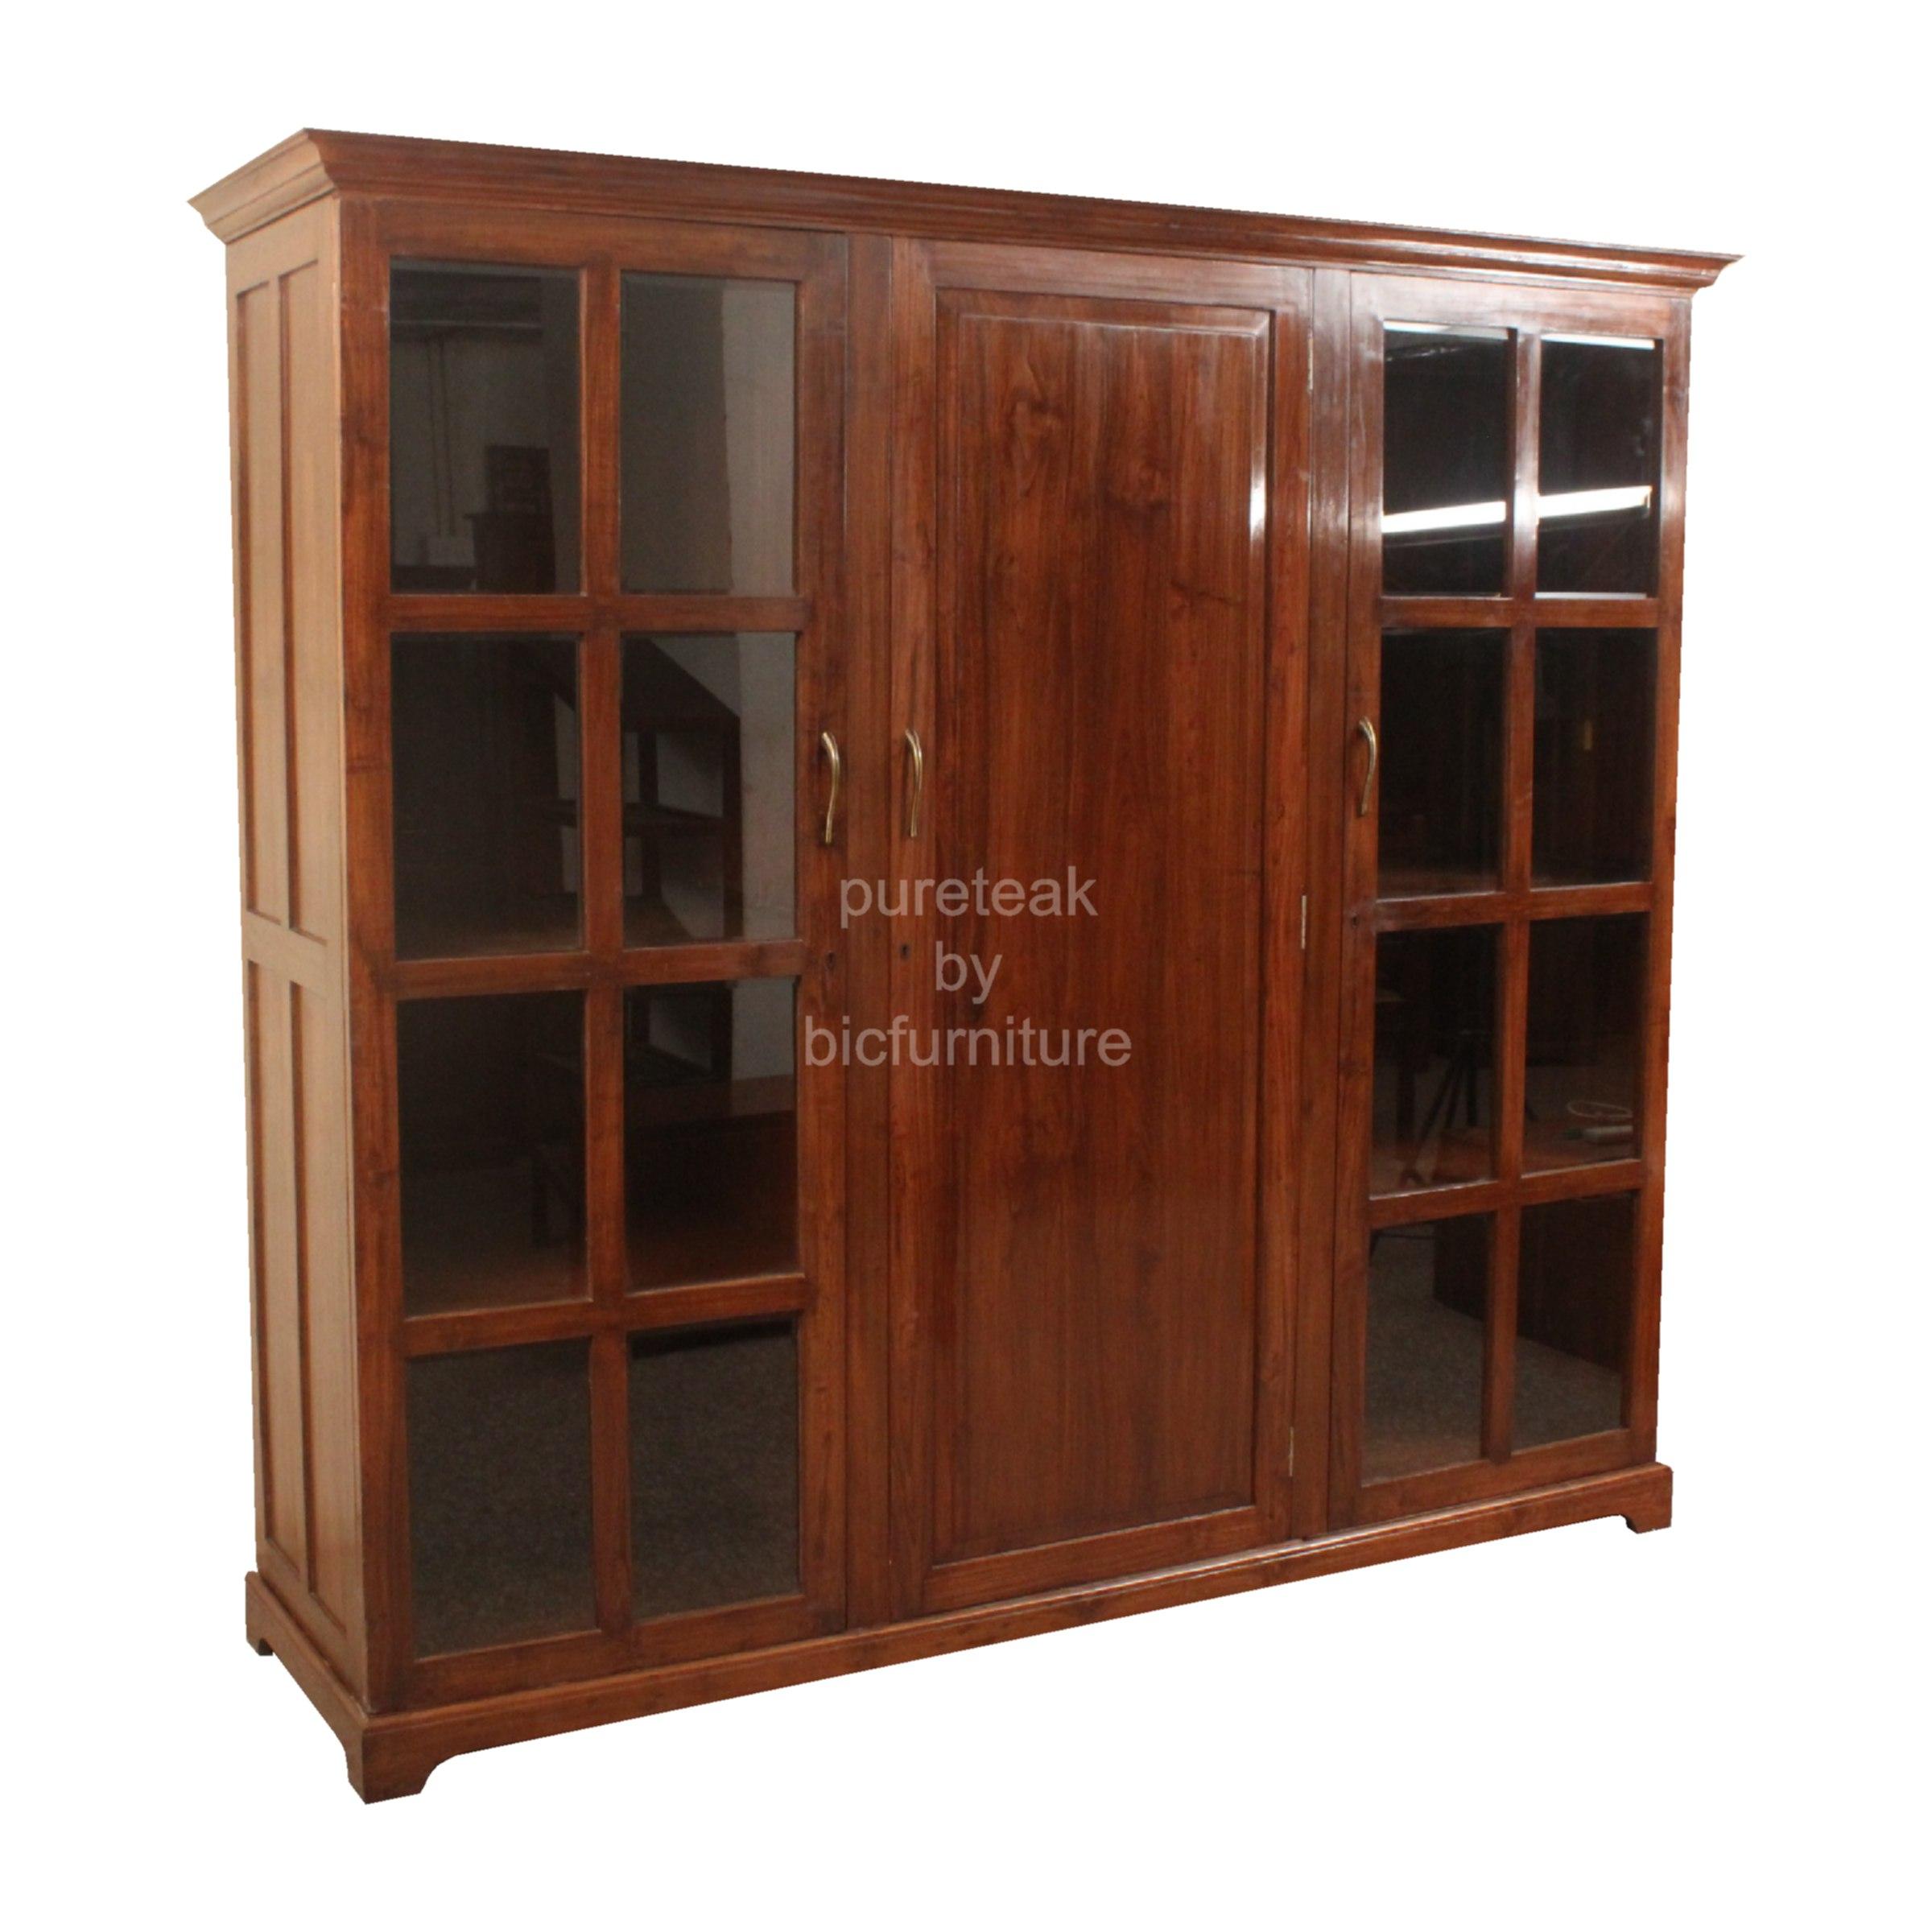 100 Space Saving Furniture Chennai Interior Design  : Teakwood3doorwardrobewithcentrewoodenpanel from 45.76.66.238 size 2400 x 2400 jpeg 390kB